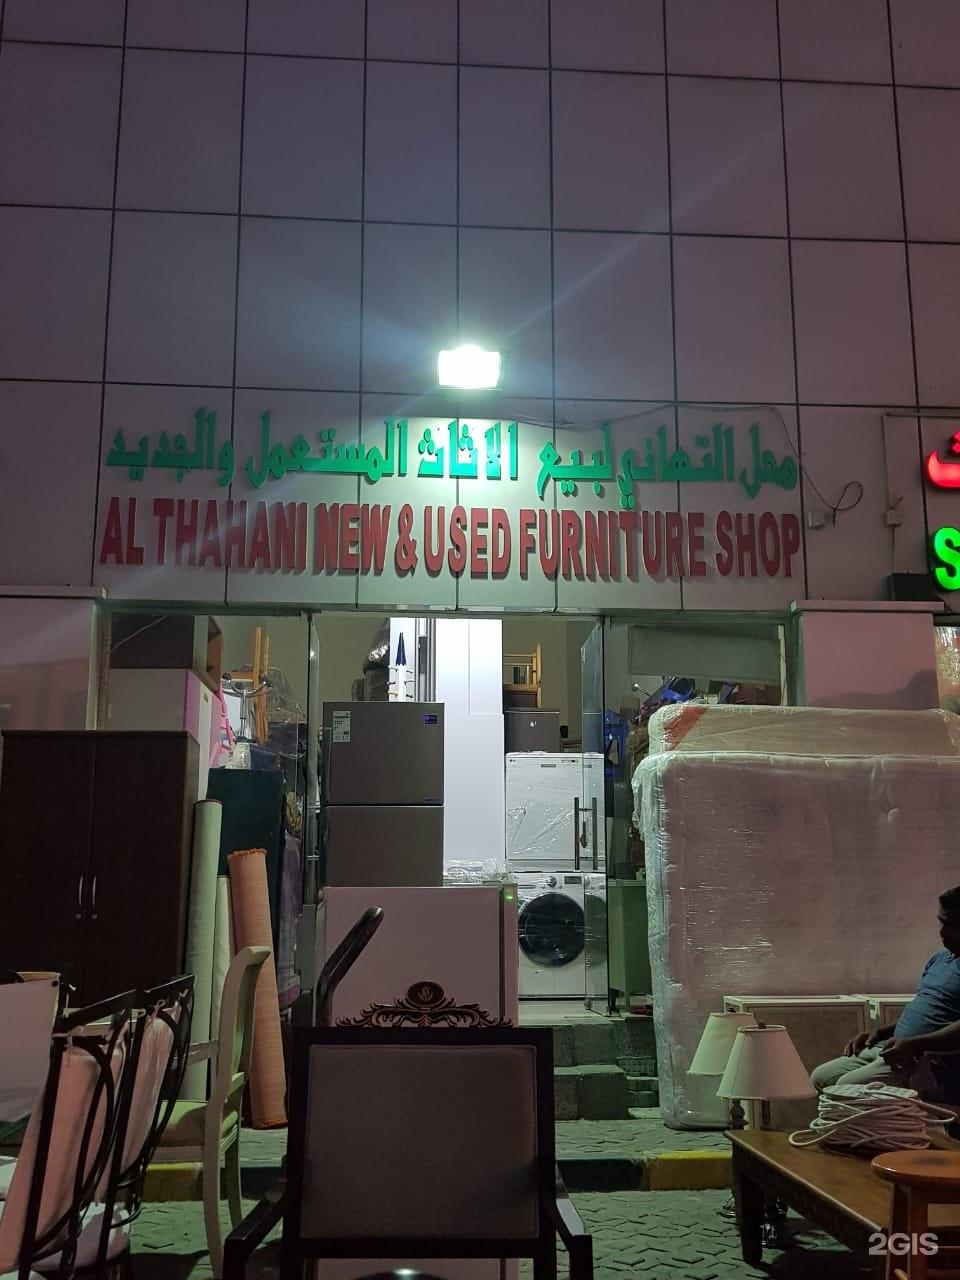 Al Thahani New & Used Furniture, shop, 8, 8 street, Abu Dhabi — 8GIS